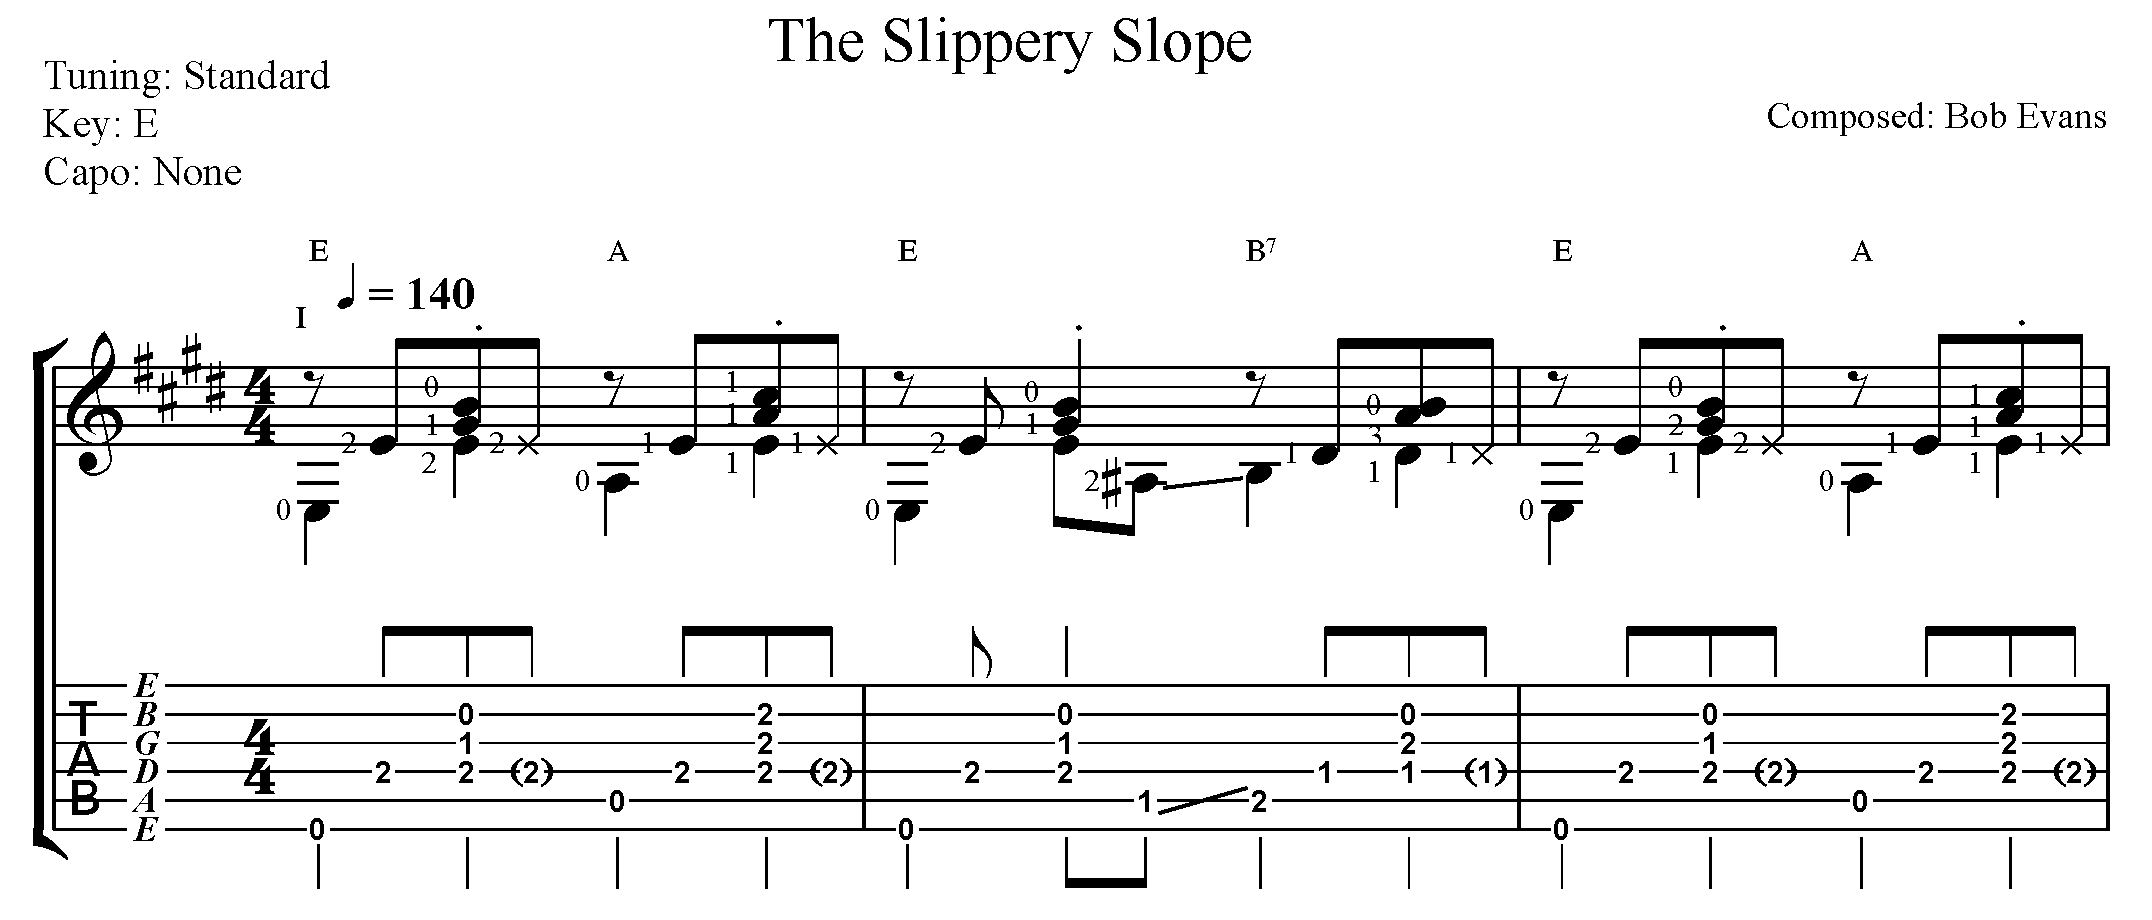 ATTD016-the-slippery-slope-thumbnail